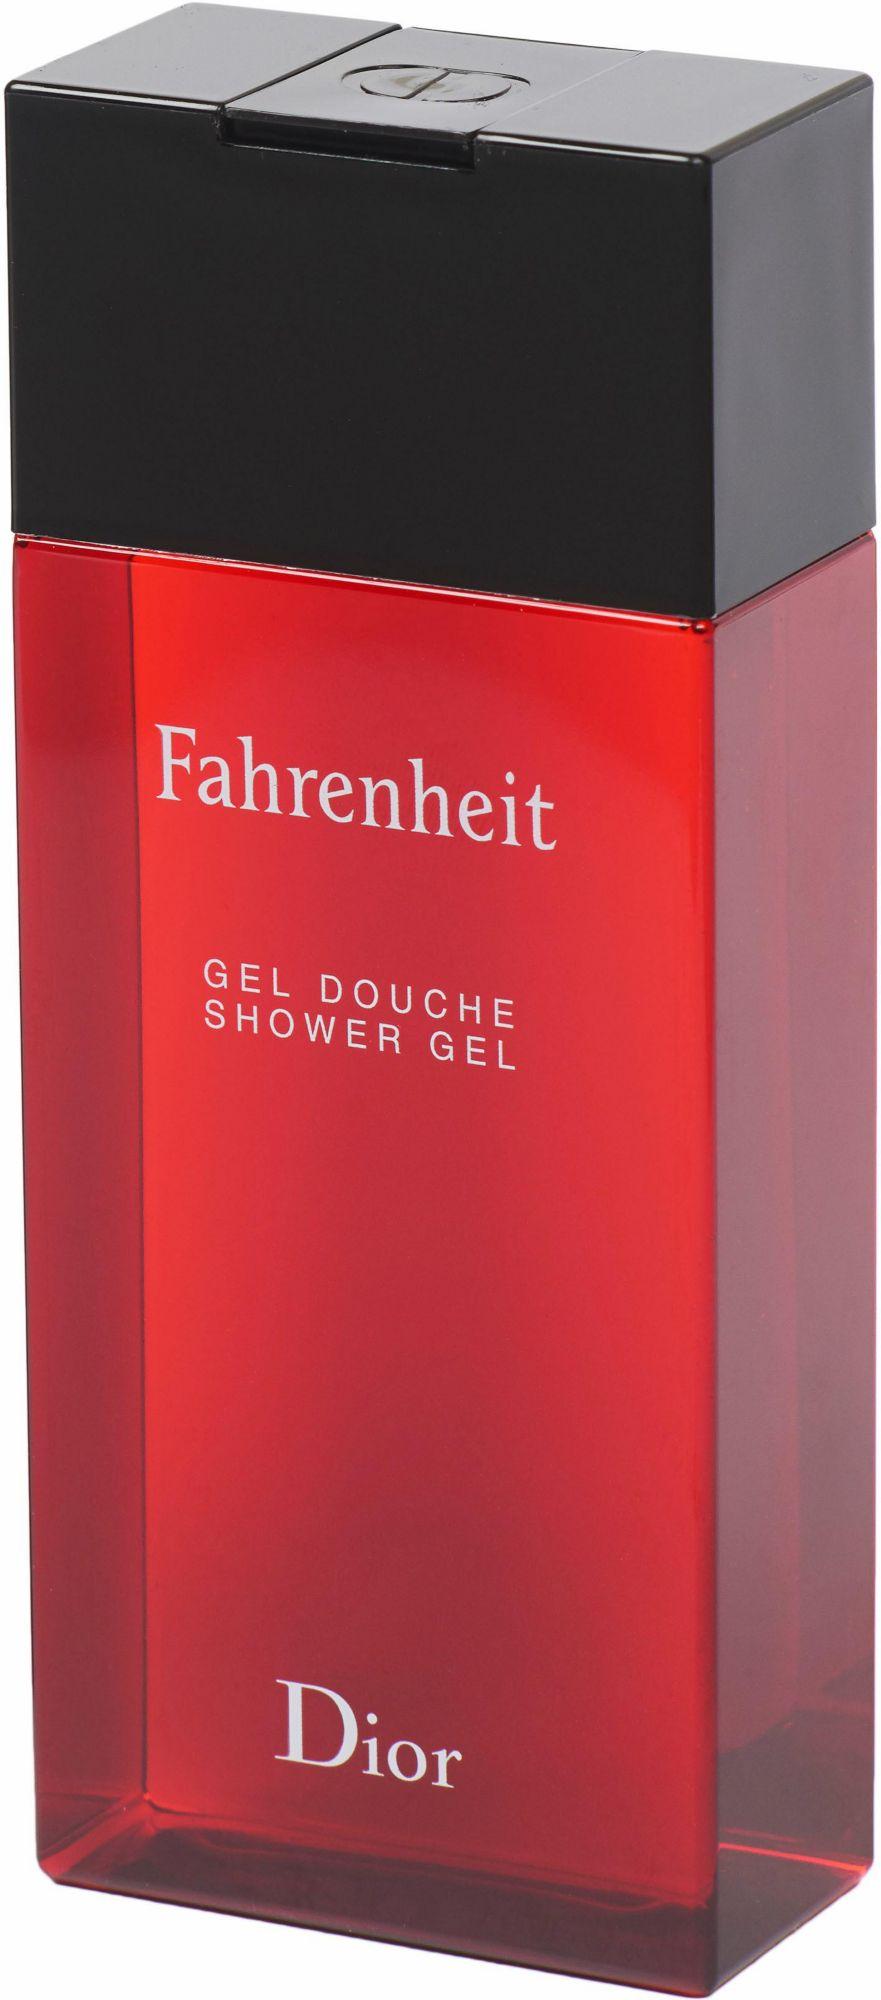 DIOR Dior, »Fahrenheit«, Duschgel